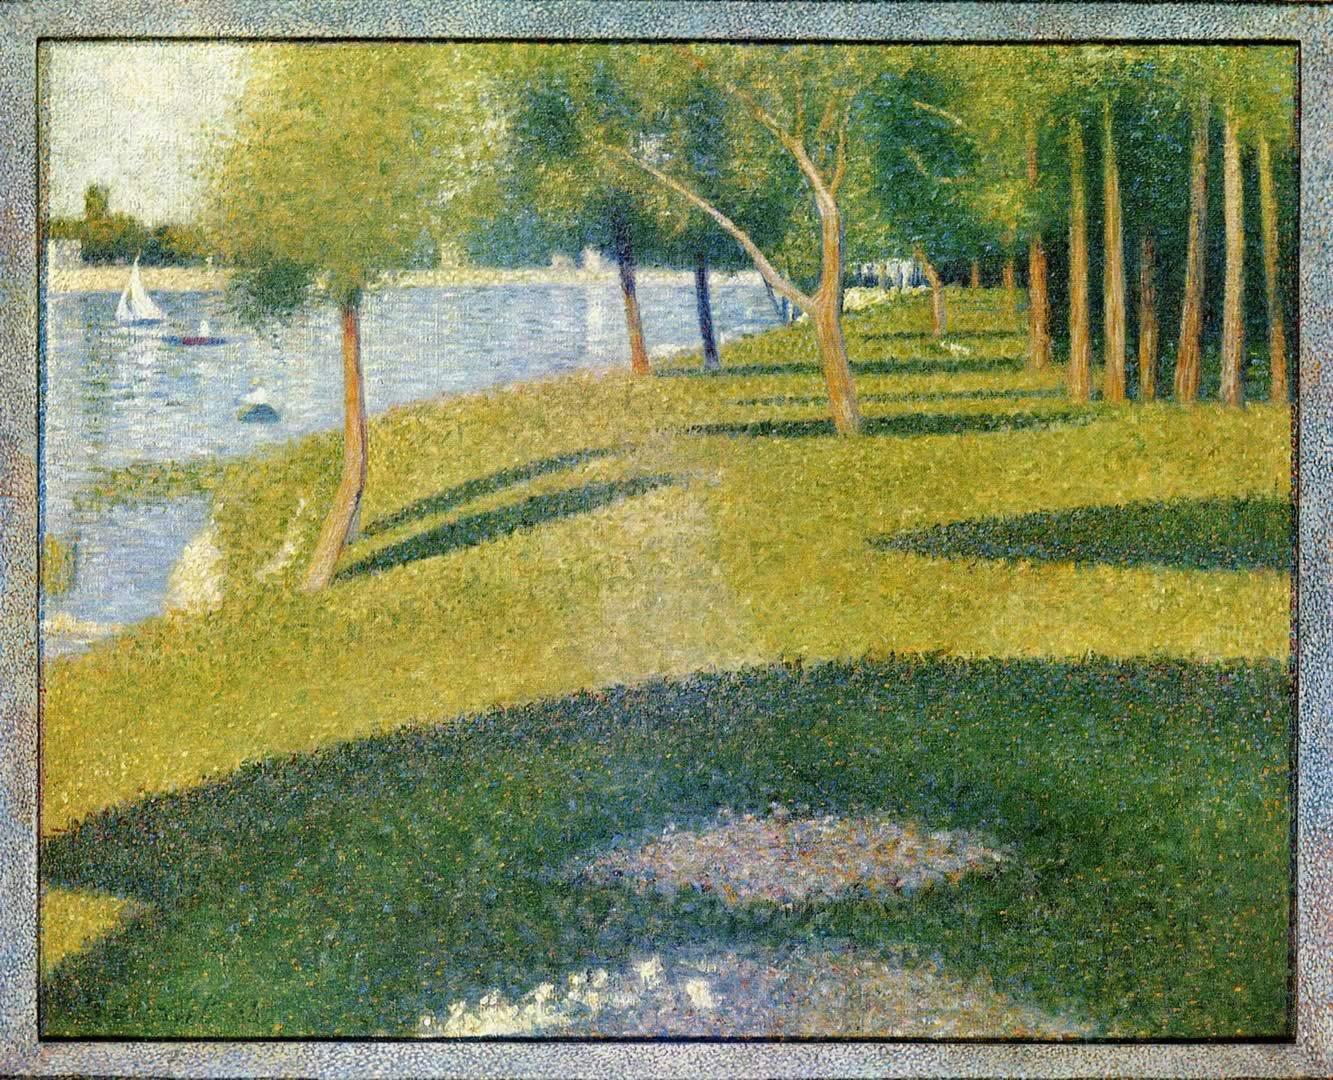 Seurat: Model, 1887 Giclee Print - Georges Seurat